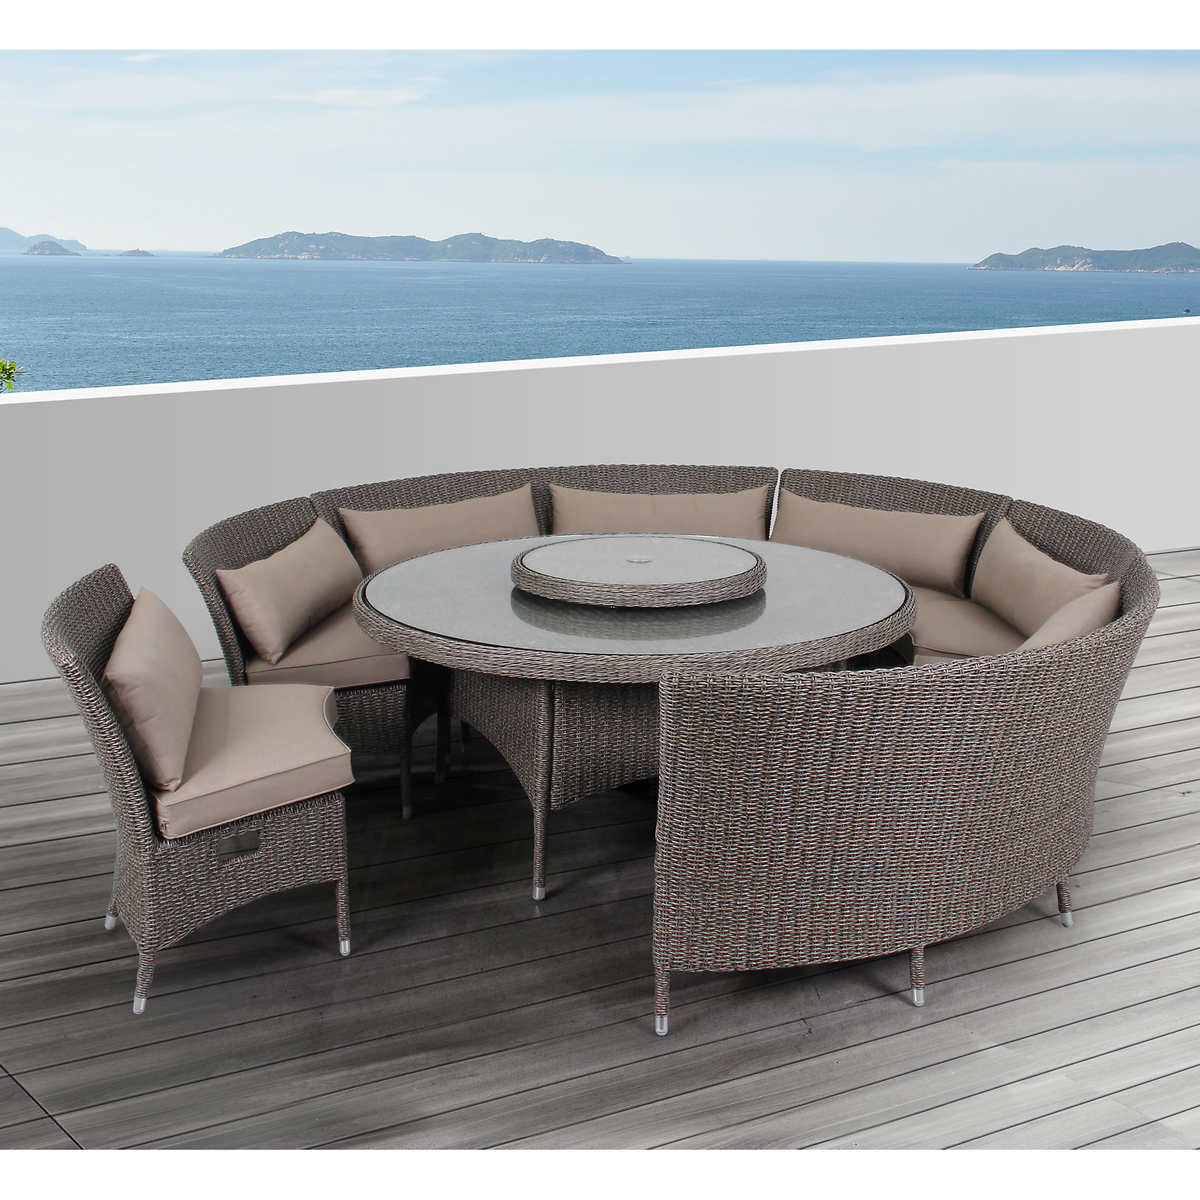 Patio furniture sets costco - Habra I 7 Piece Dining Set